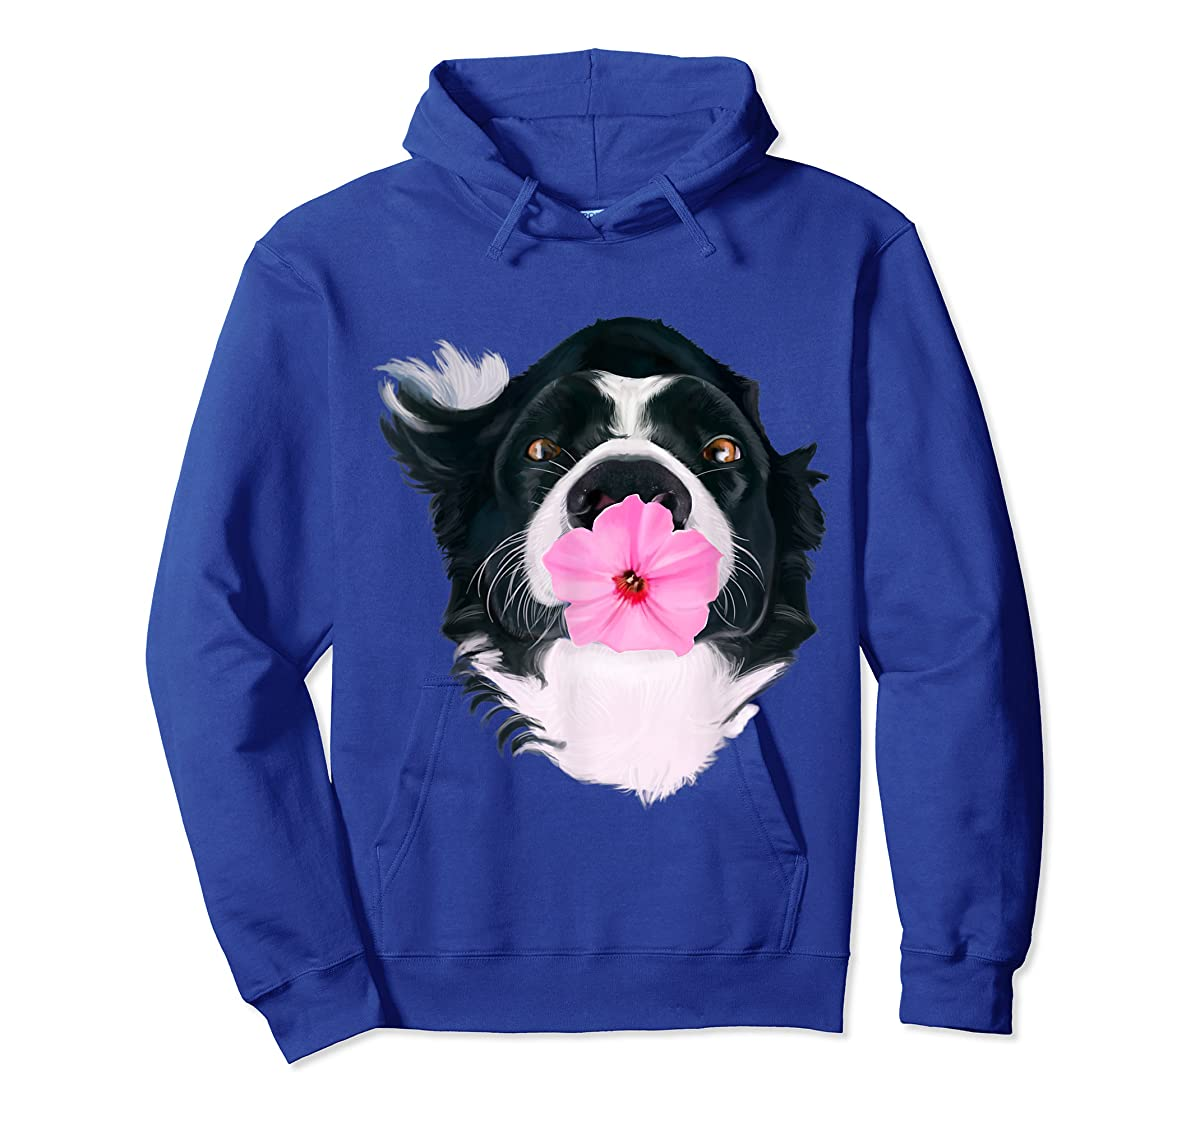 Border Collie Sweet Dog T-Shirt Dogs Tee Shirt Gifts-Hoodie-Royal